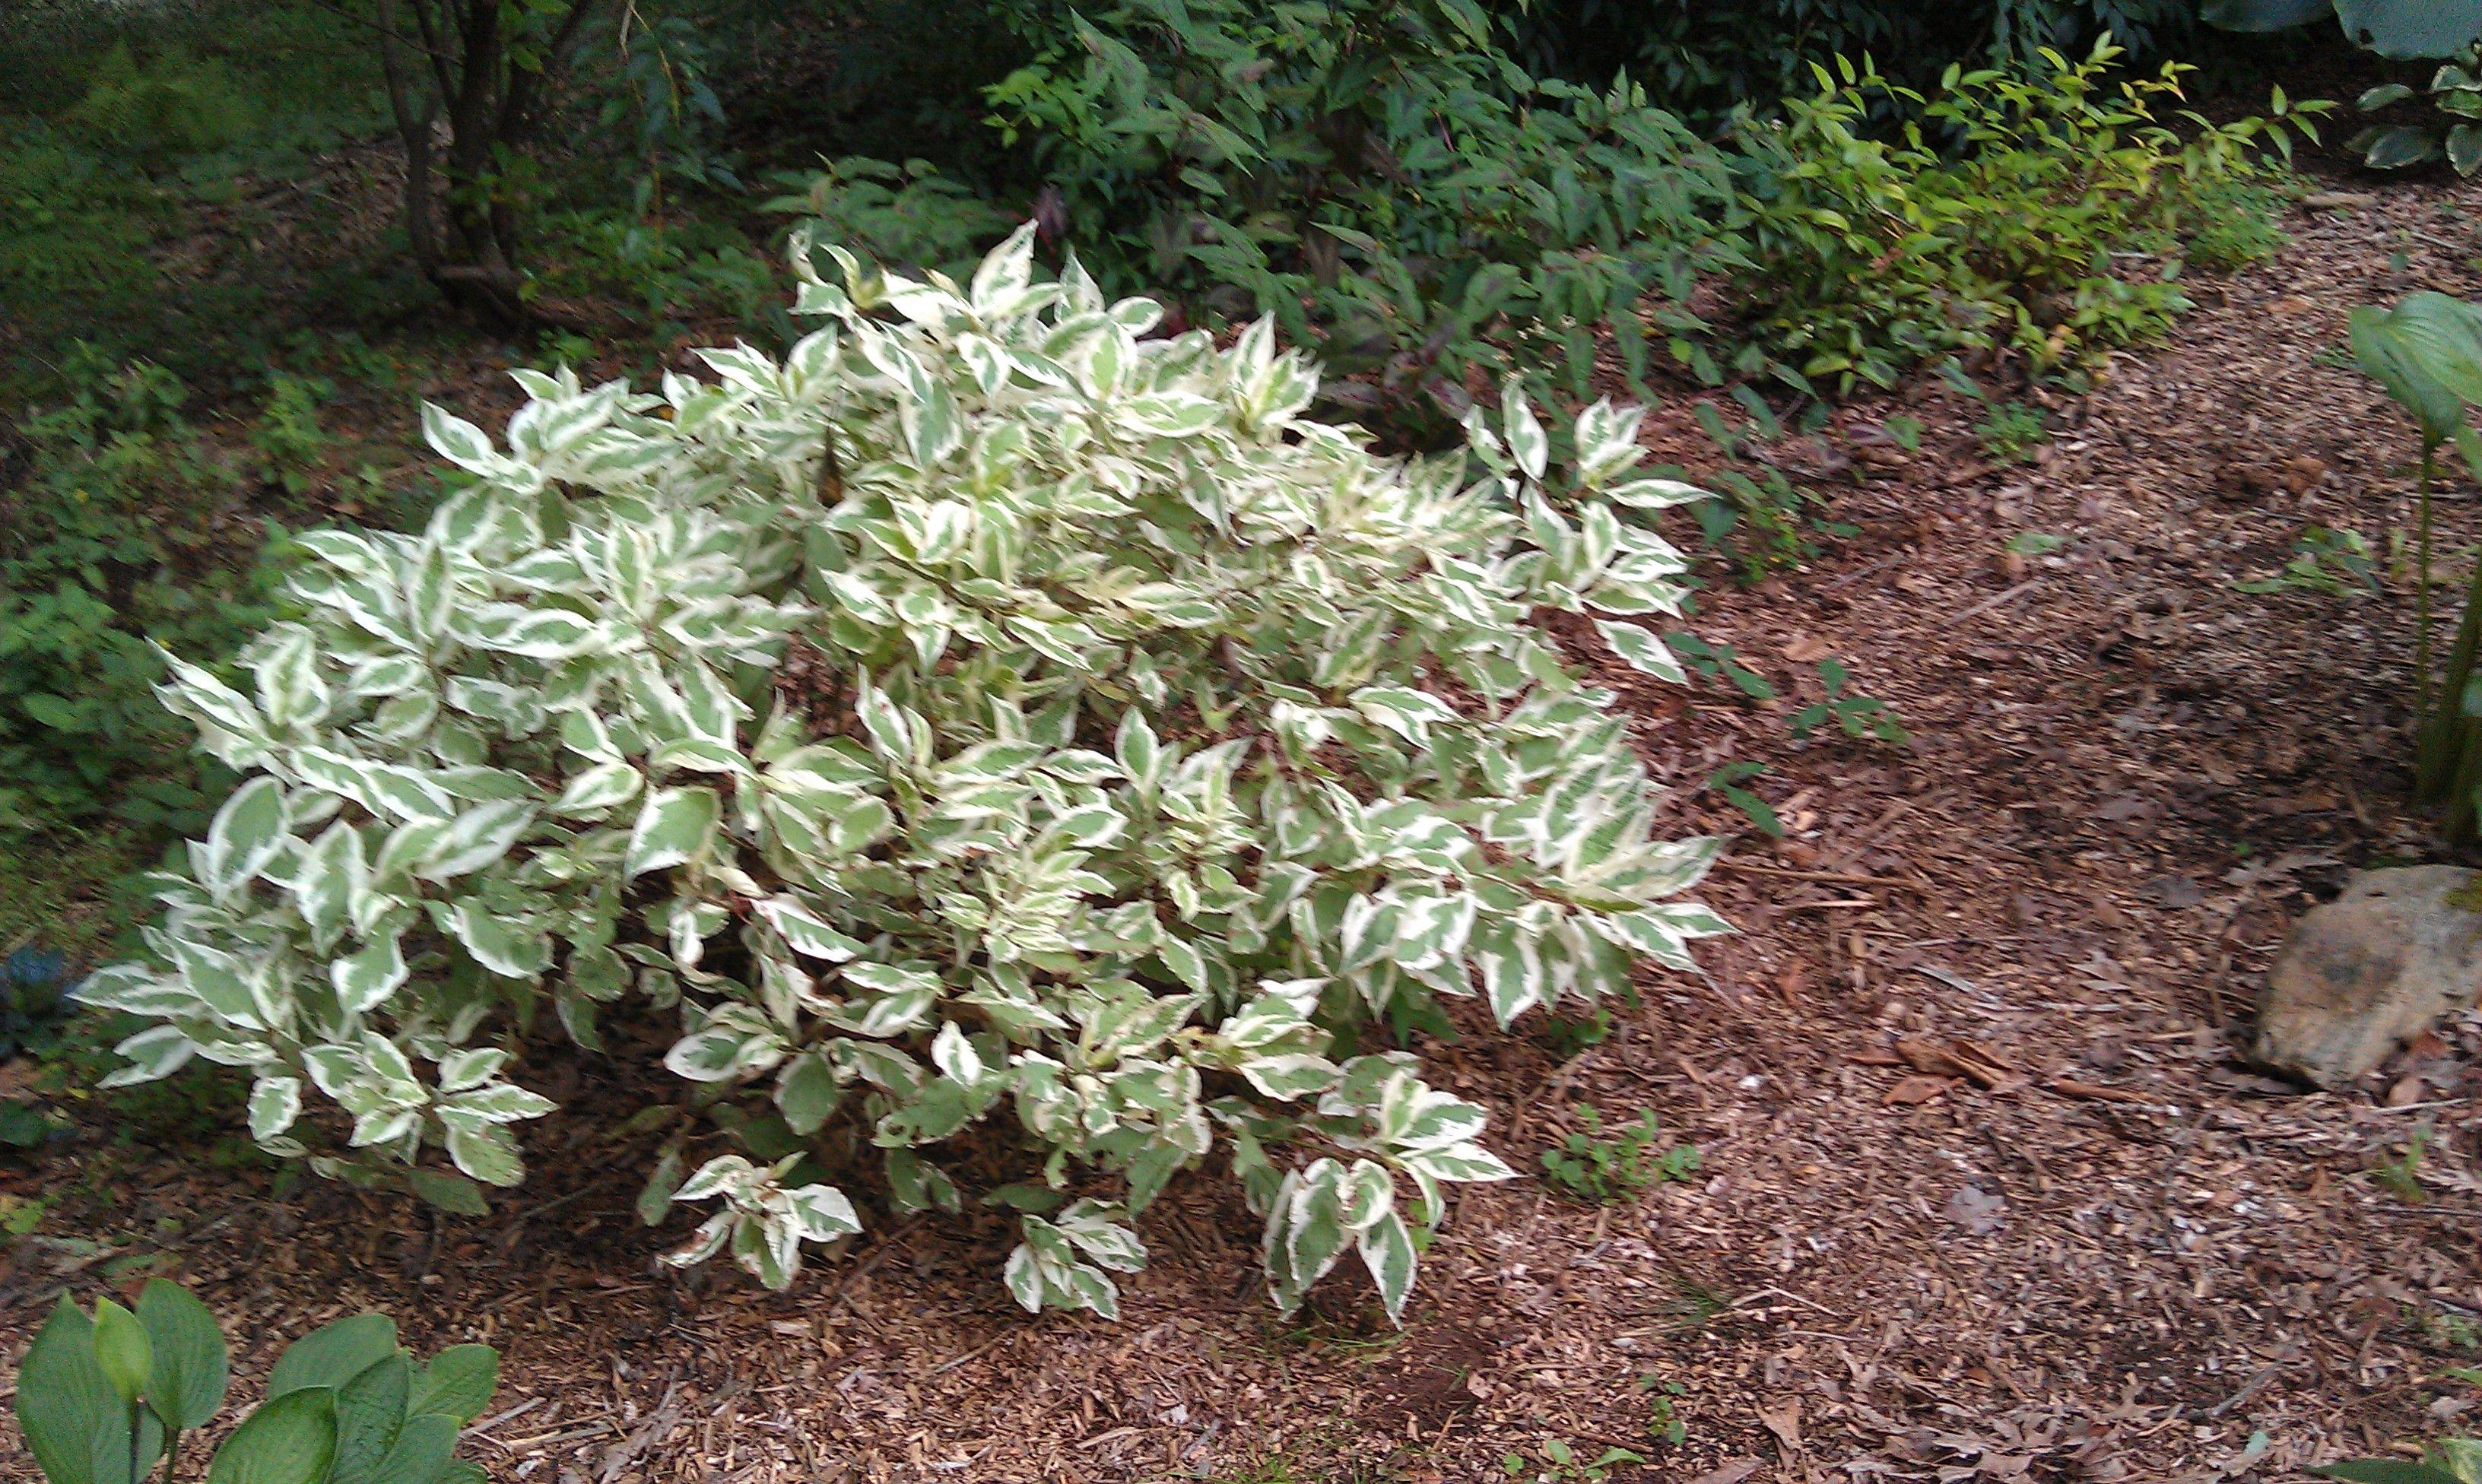 Variegated Dogwood Shrub In My Garden Garden Beauties